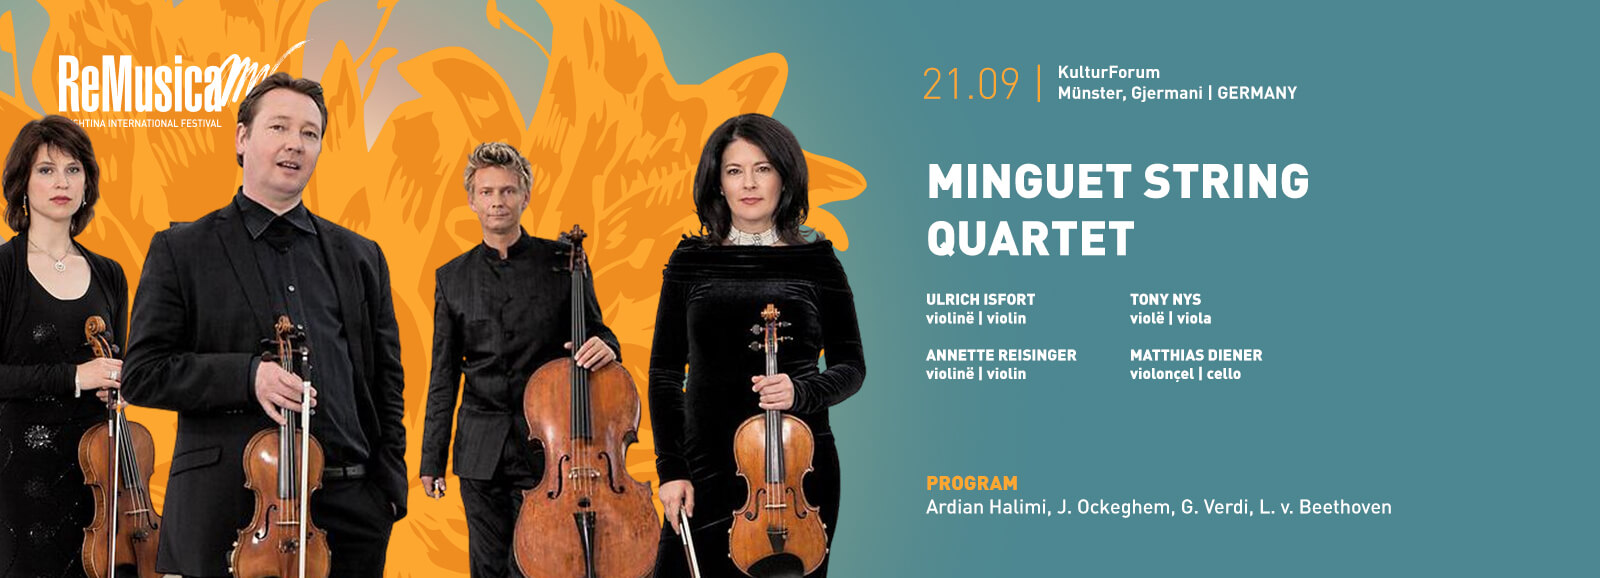 Minguet String Quartet